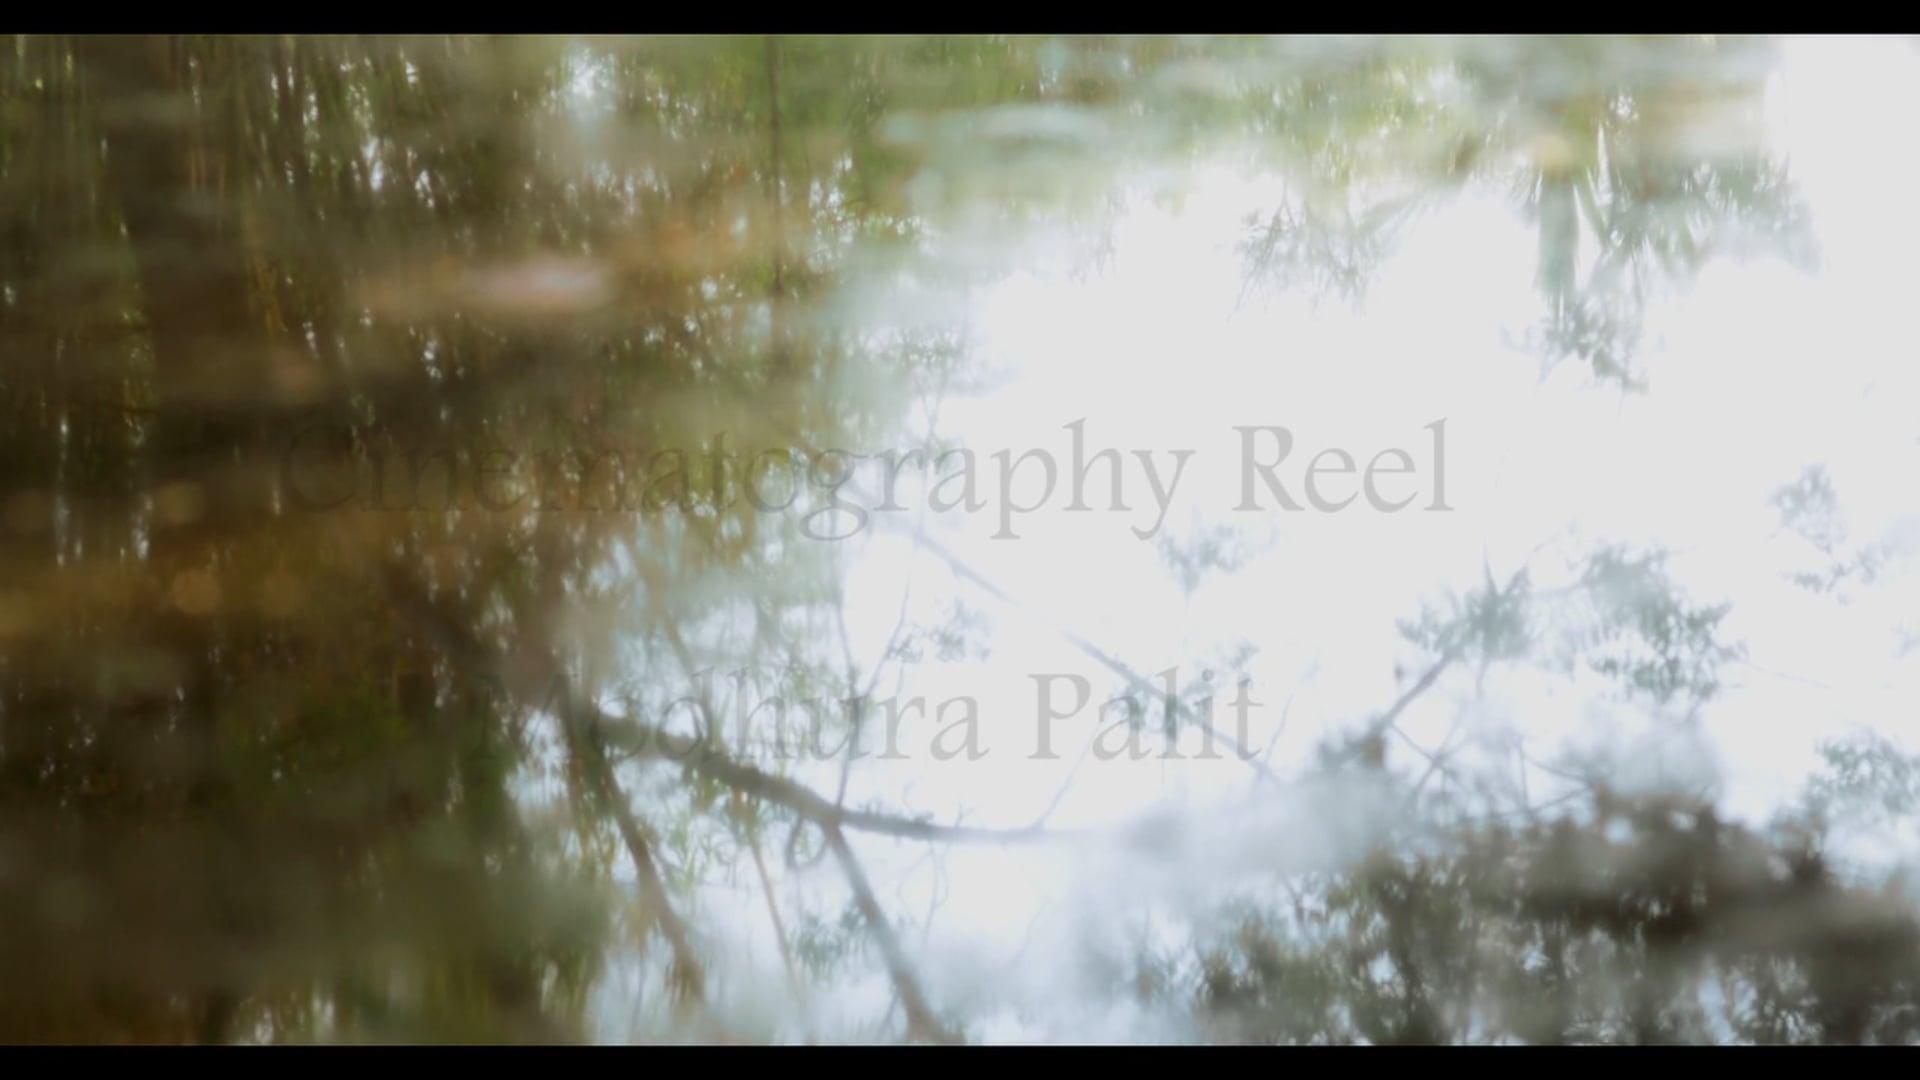 Cinematography Showreel 2015 - Modhura Palit